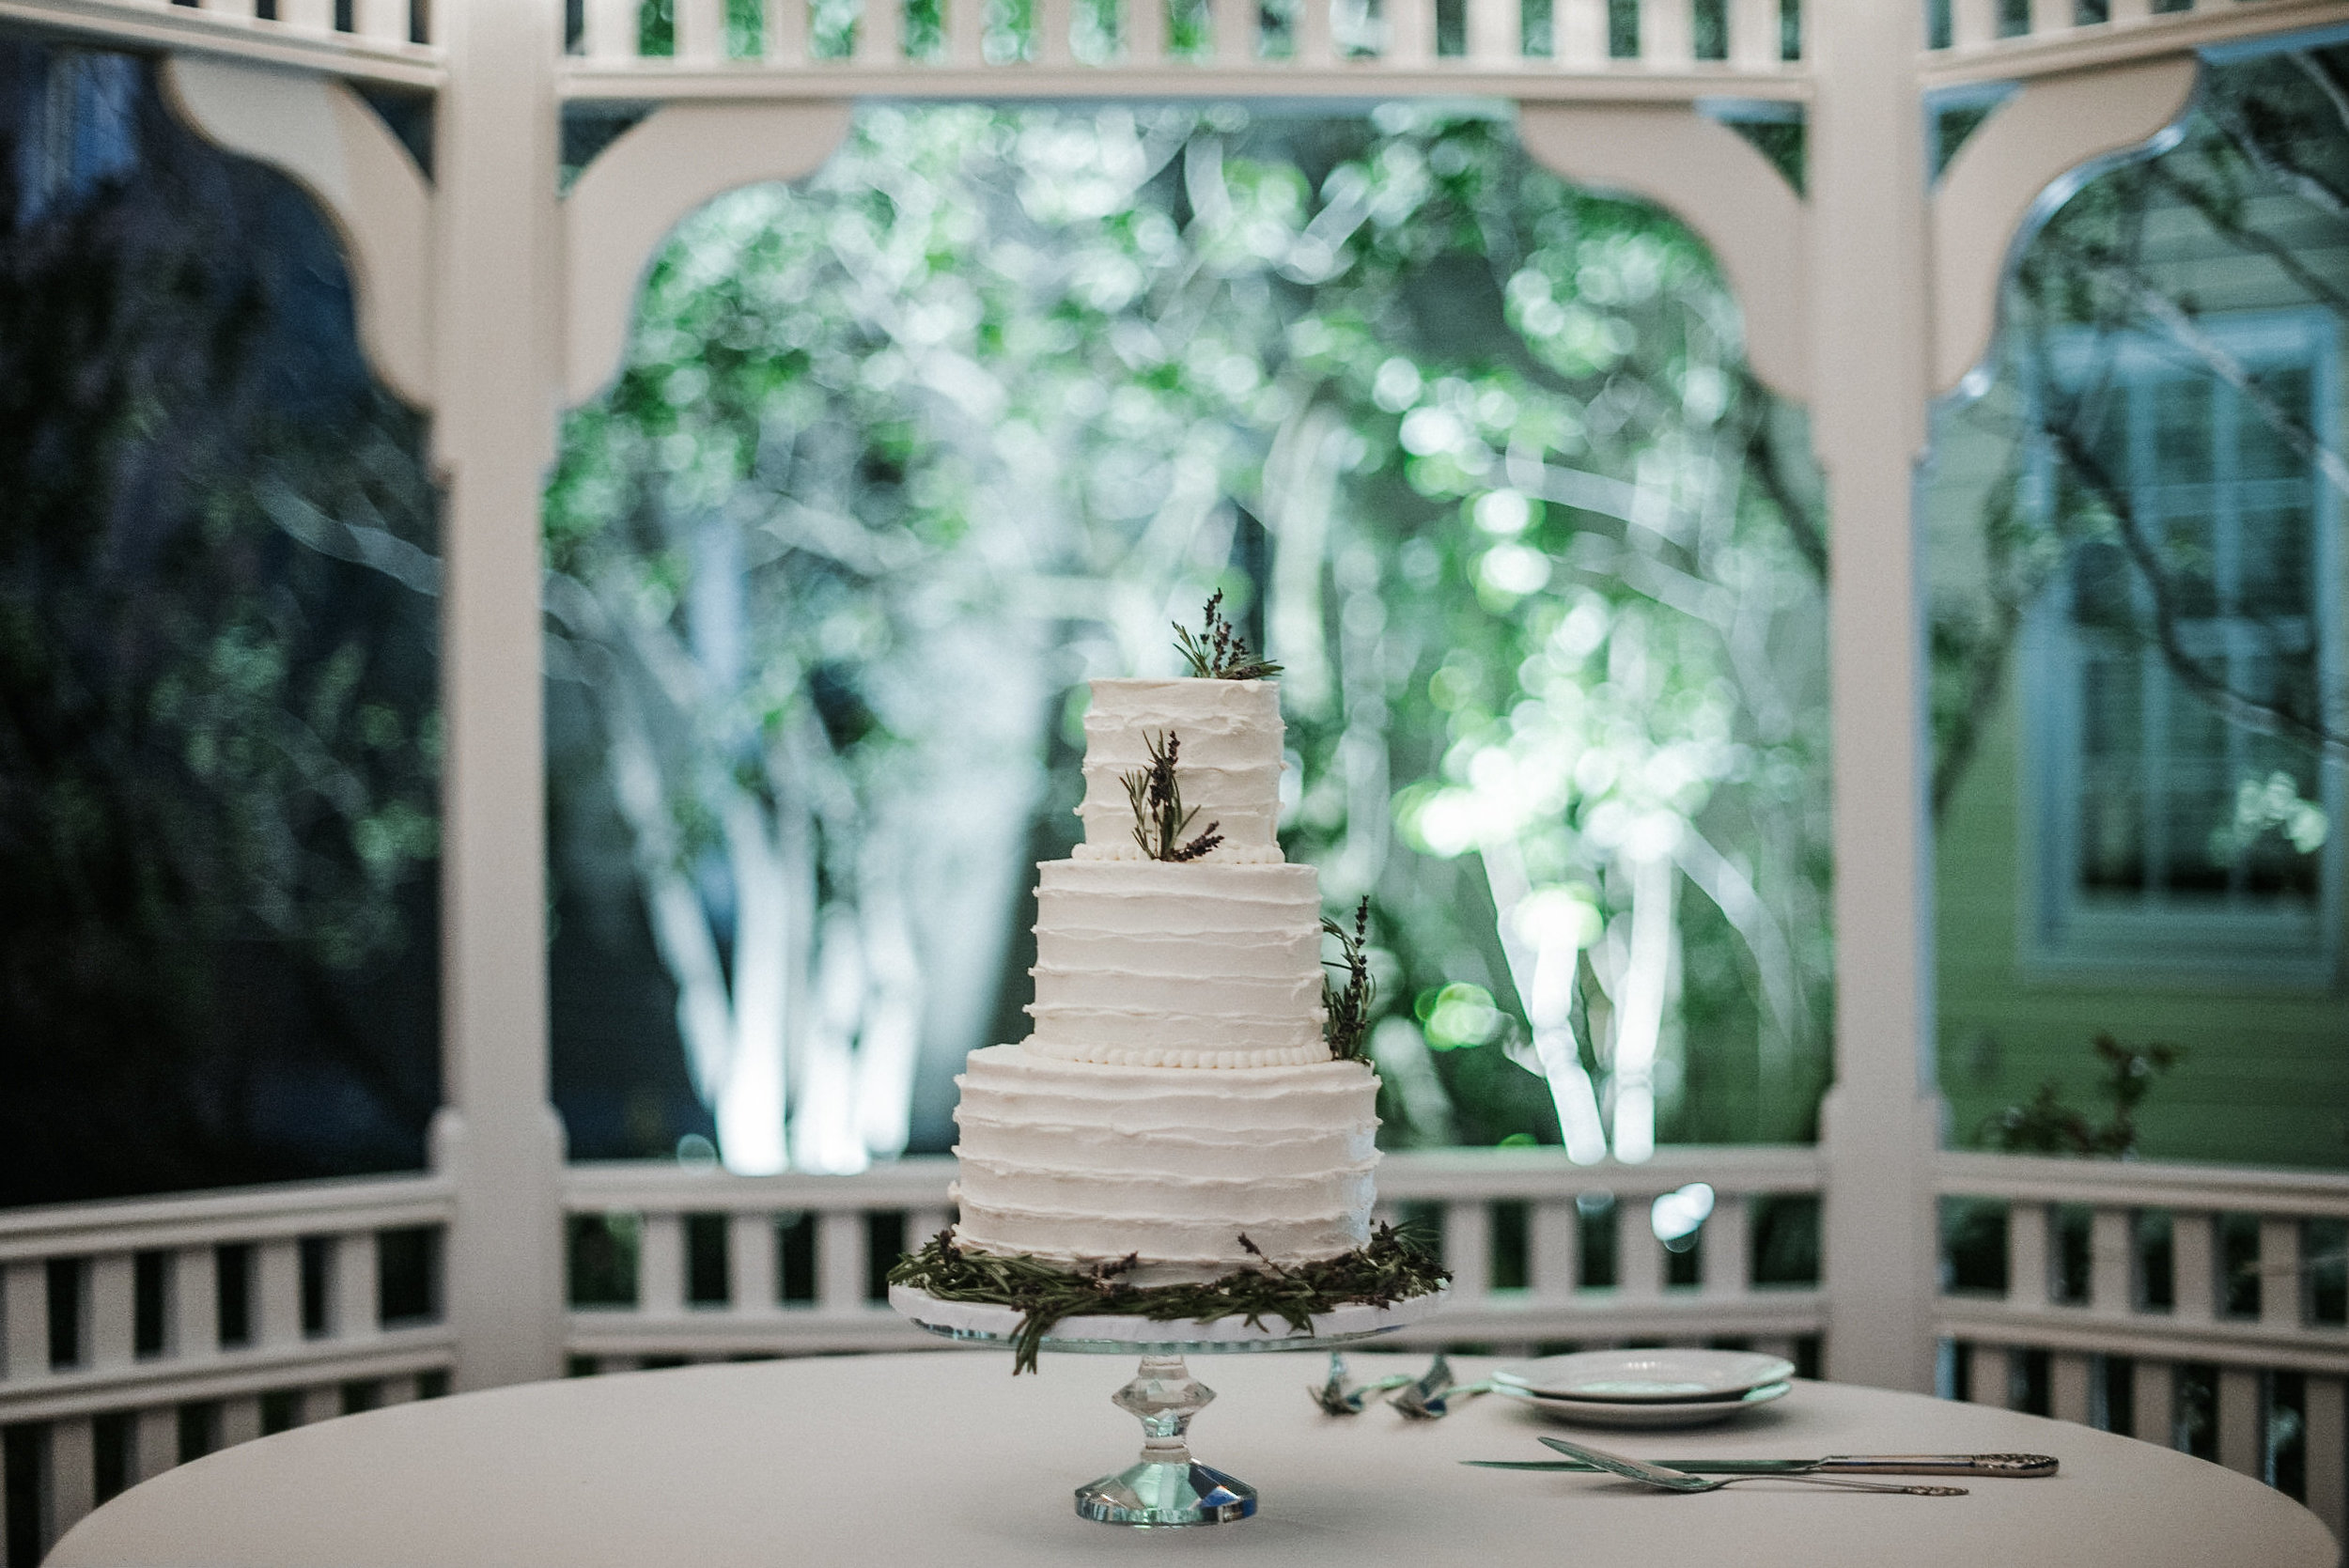 Wedding cake inside gazebo